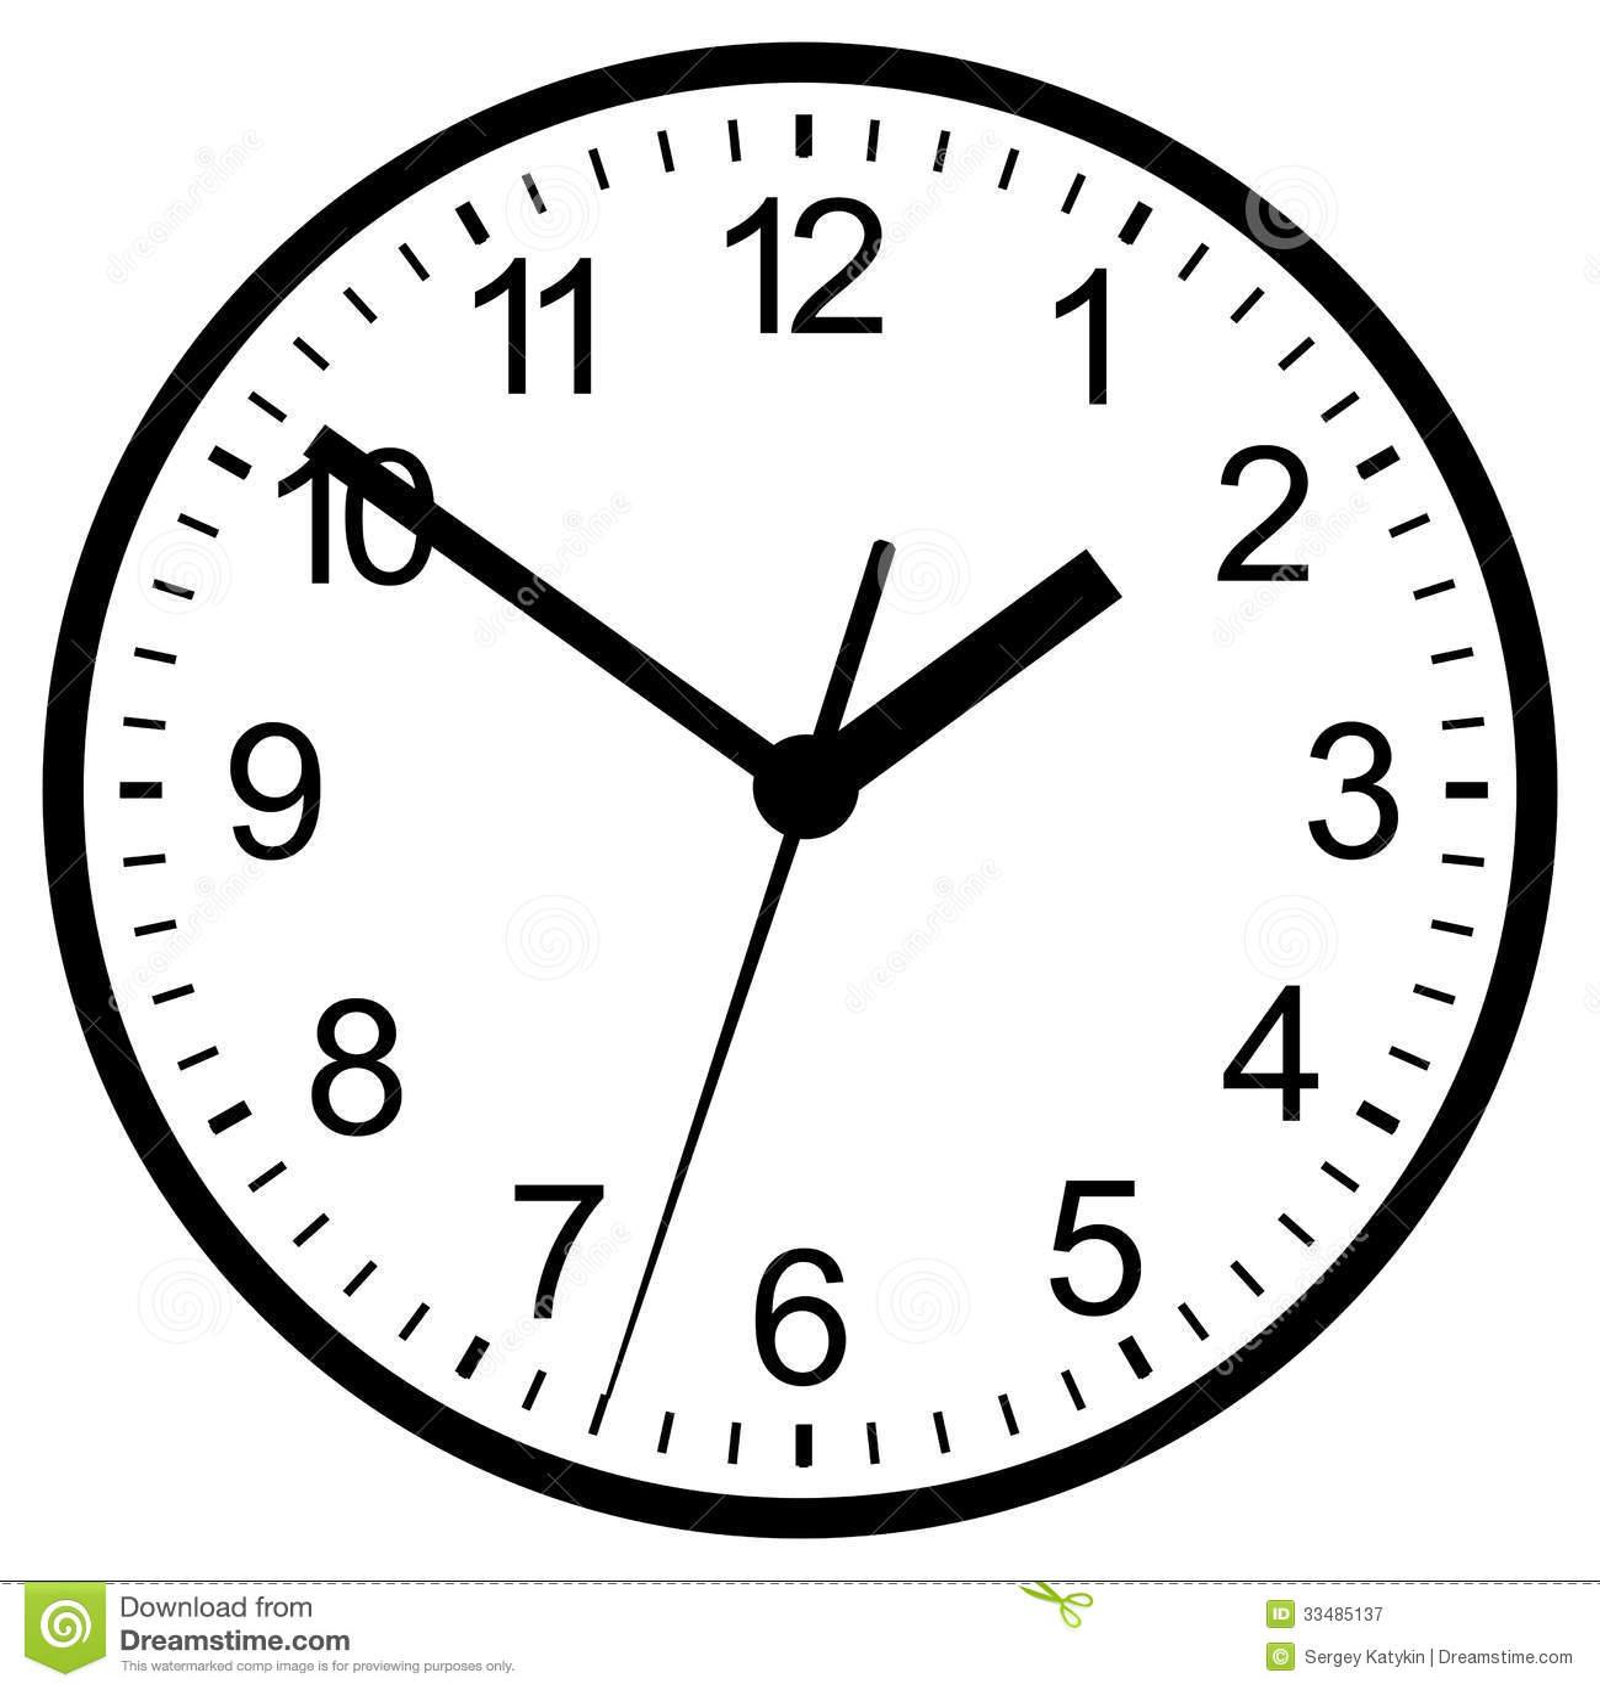 Wall Mounted Digital Clock Royalty Free Stock Photography